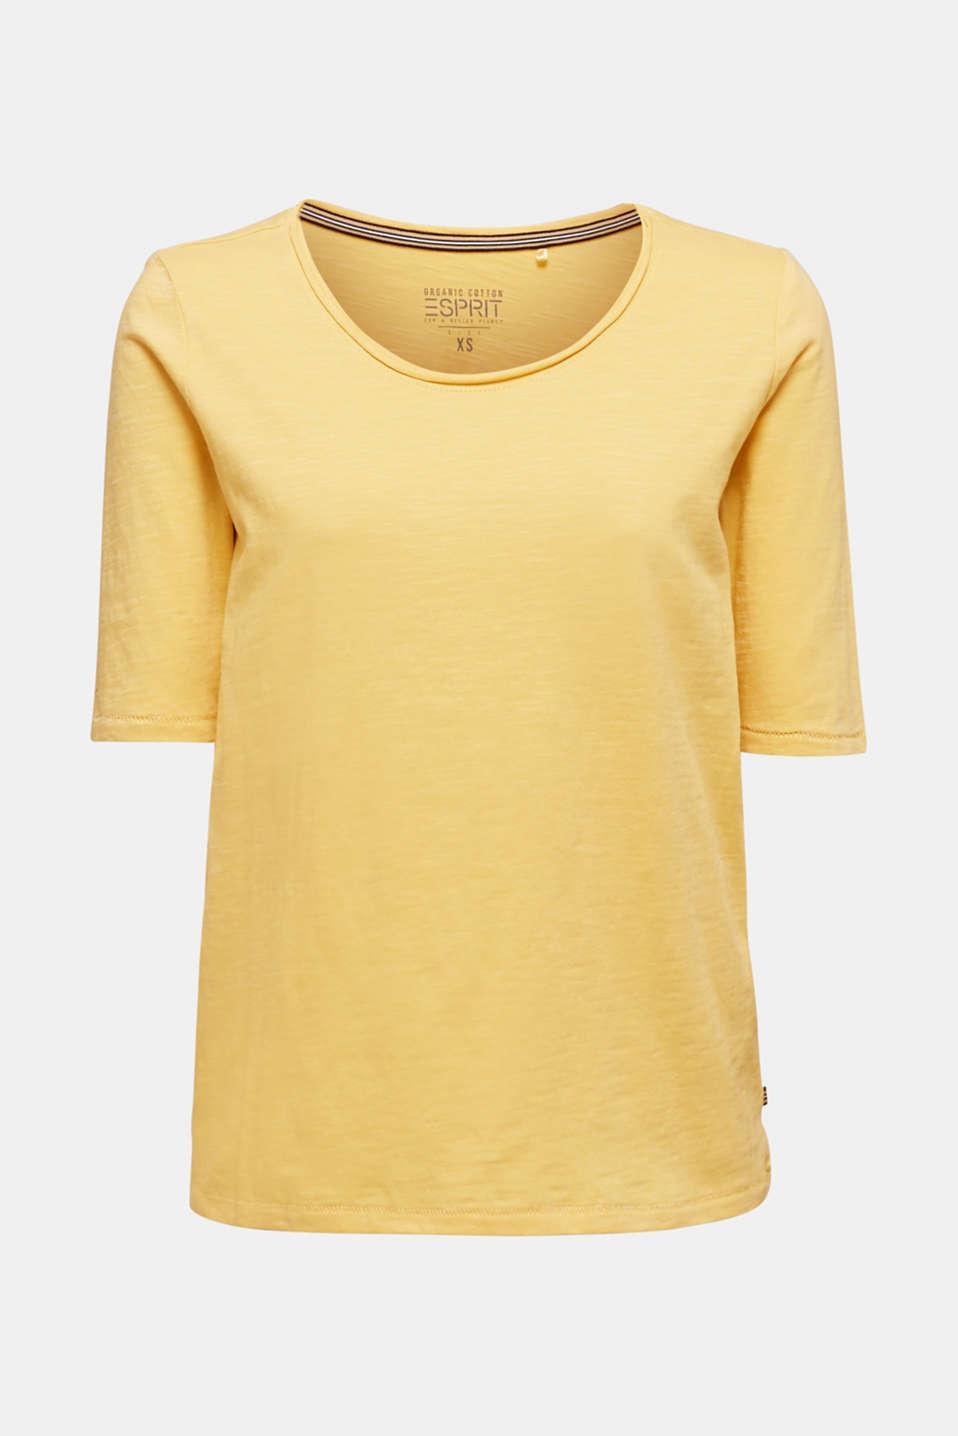 T-Shirts, YELLOW 4, detail image number 6